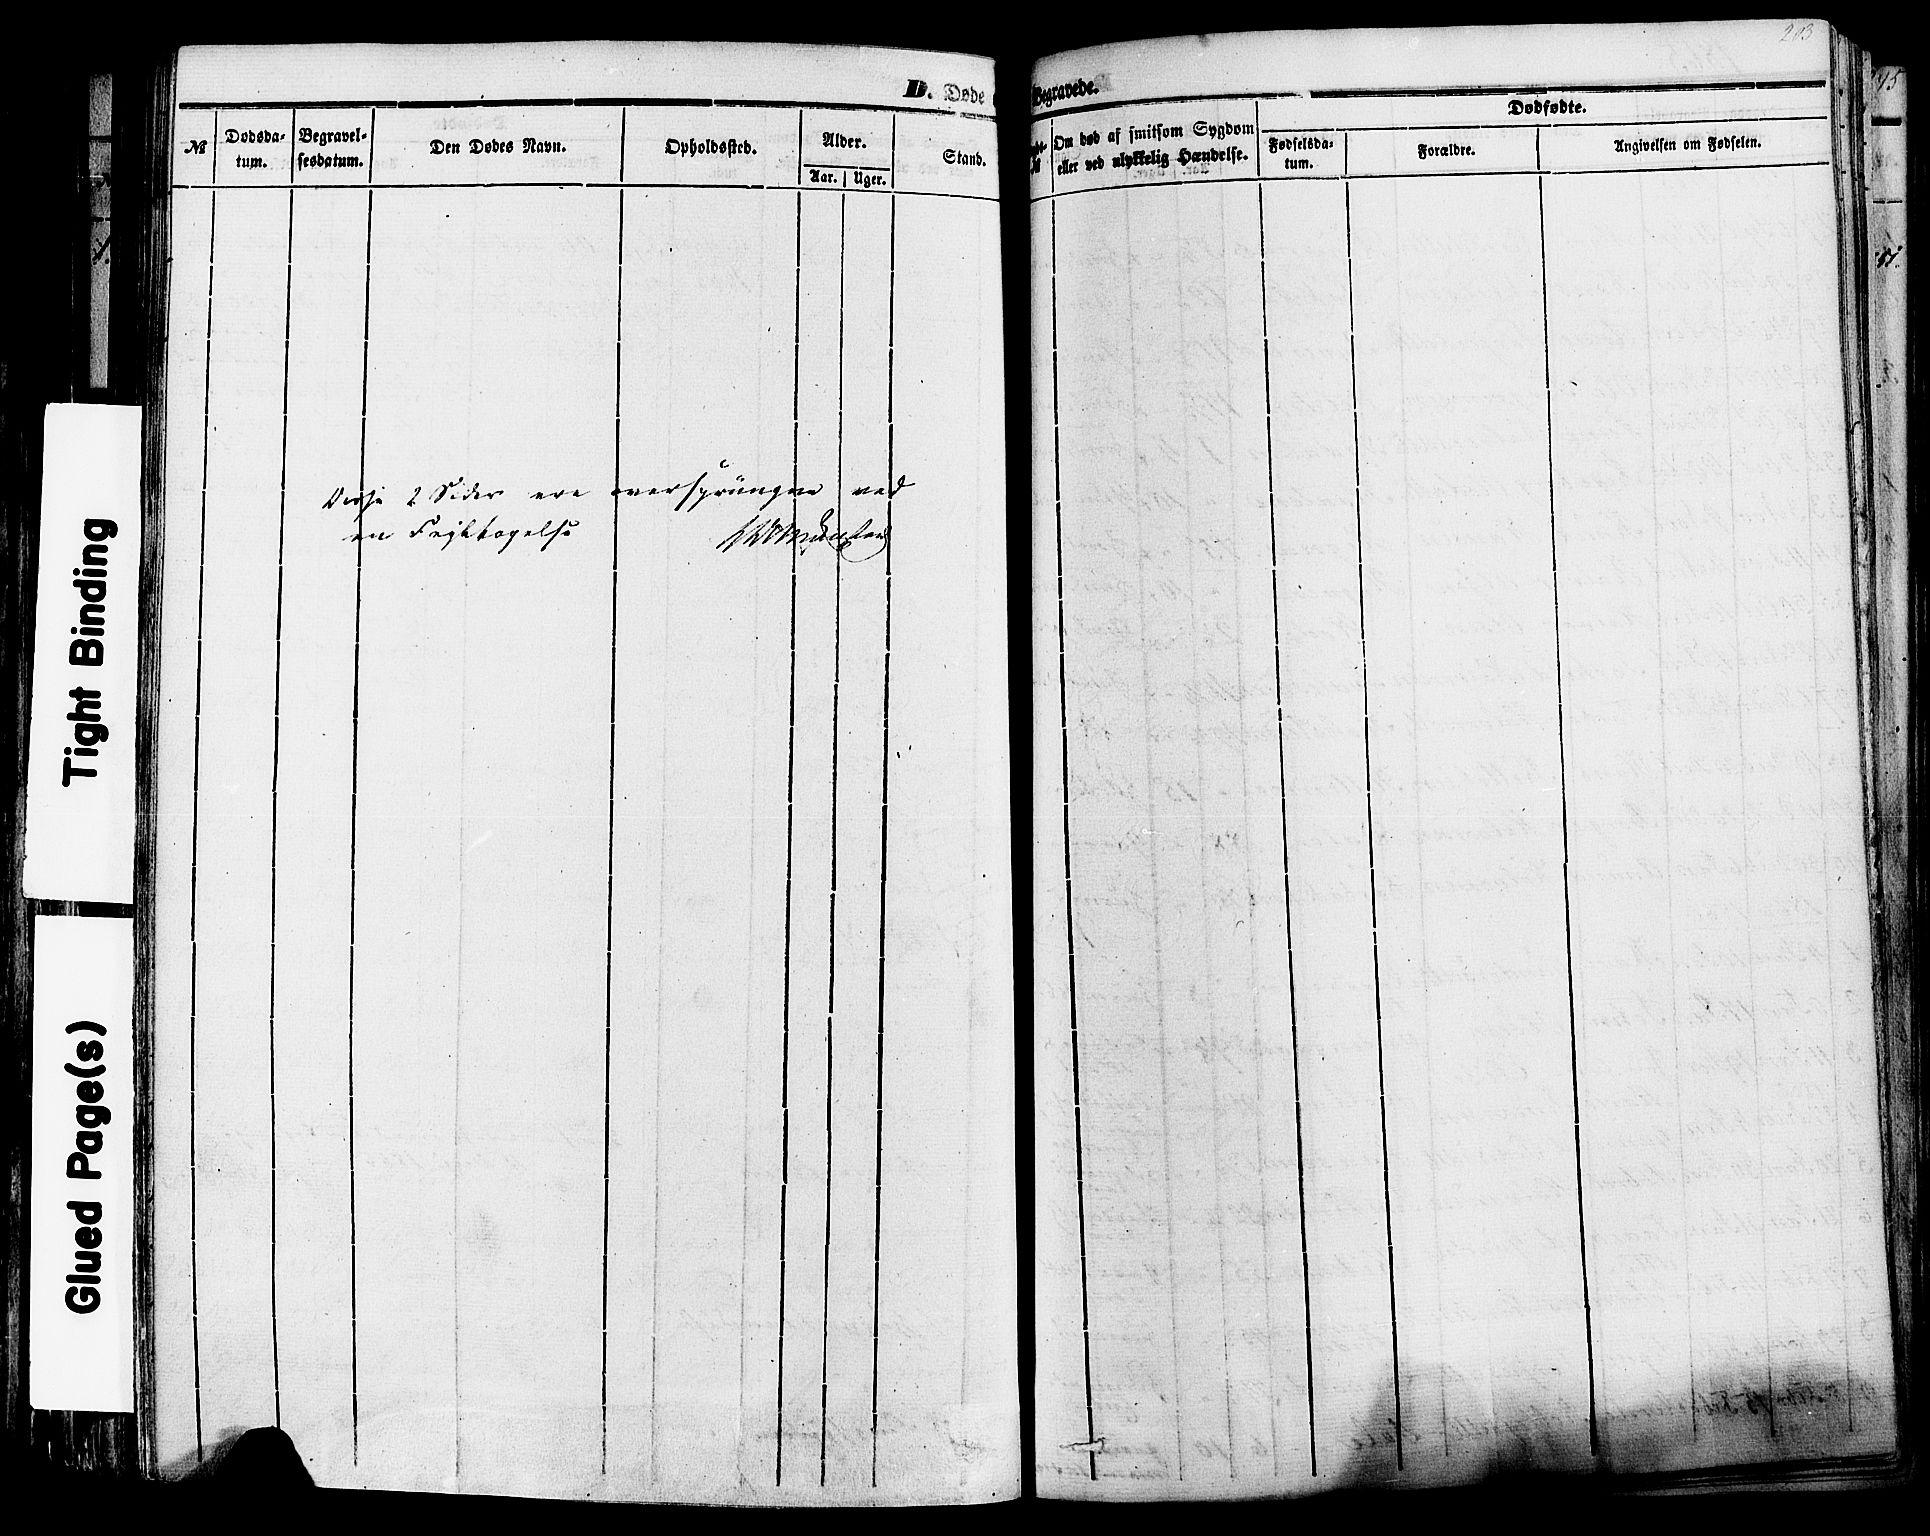 SAKO, Sauherad kirkebøker, F/Fa/L0007: Ministerialbok nr. I 7, 1851-1873, s. 203